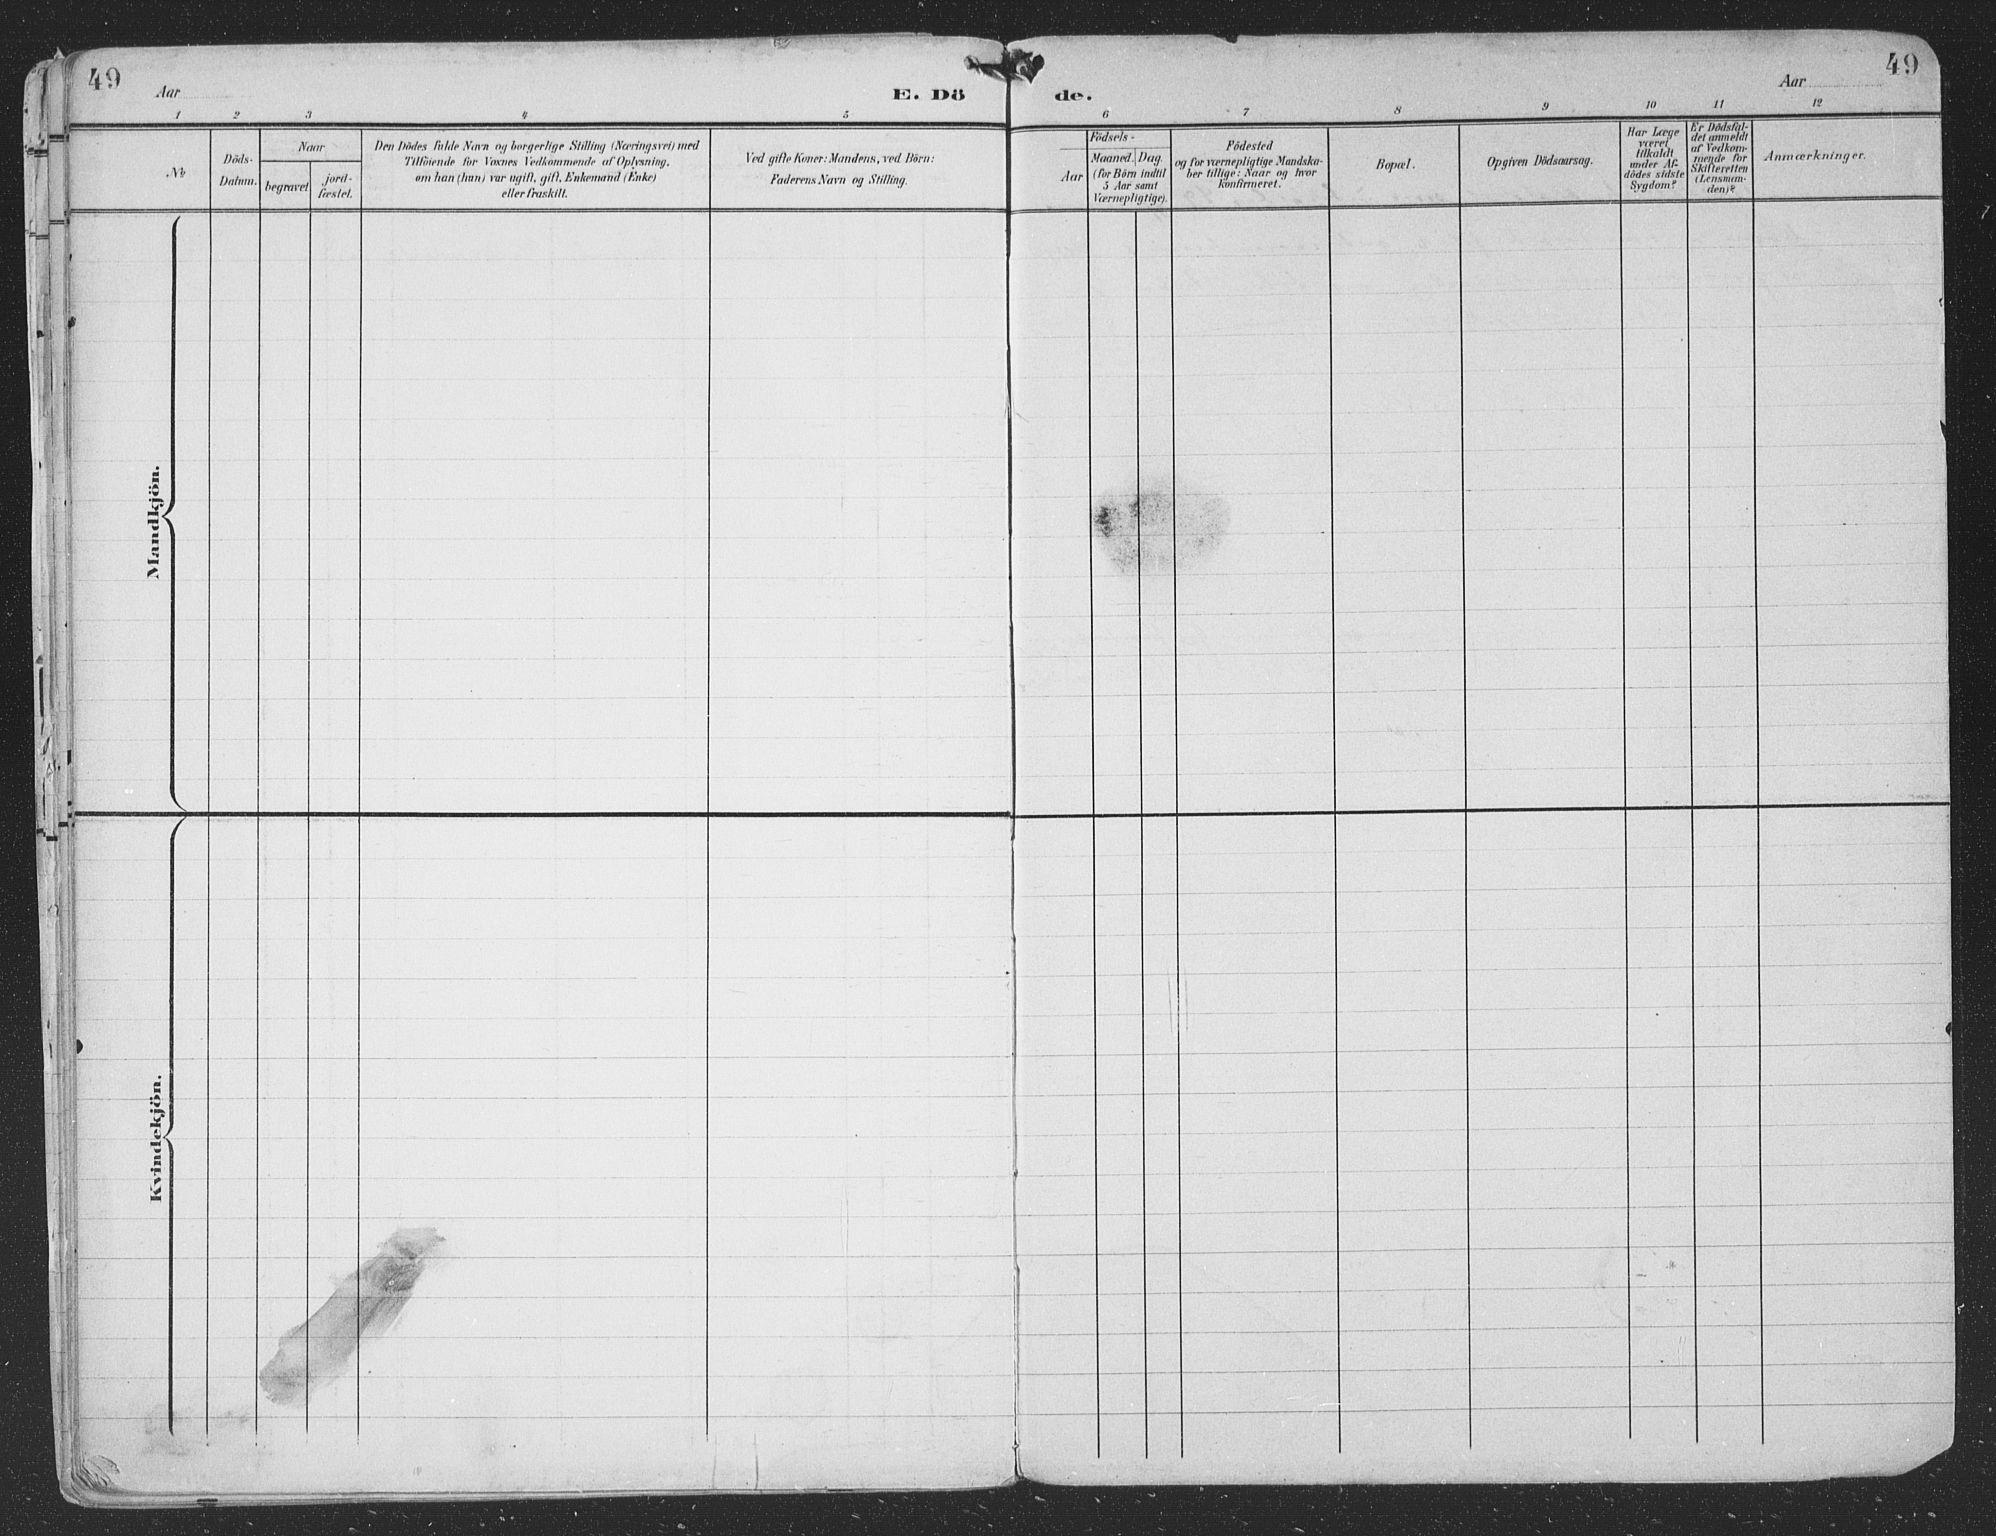 SAT, Ministerialprotokoller, klokkerbøker og fødselsregistre - Nordland, 866/L0940: Ministerialbok nr. 866A03, 1902-1926, s. 49